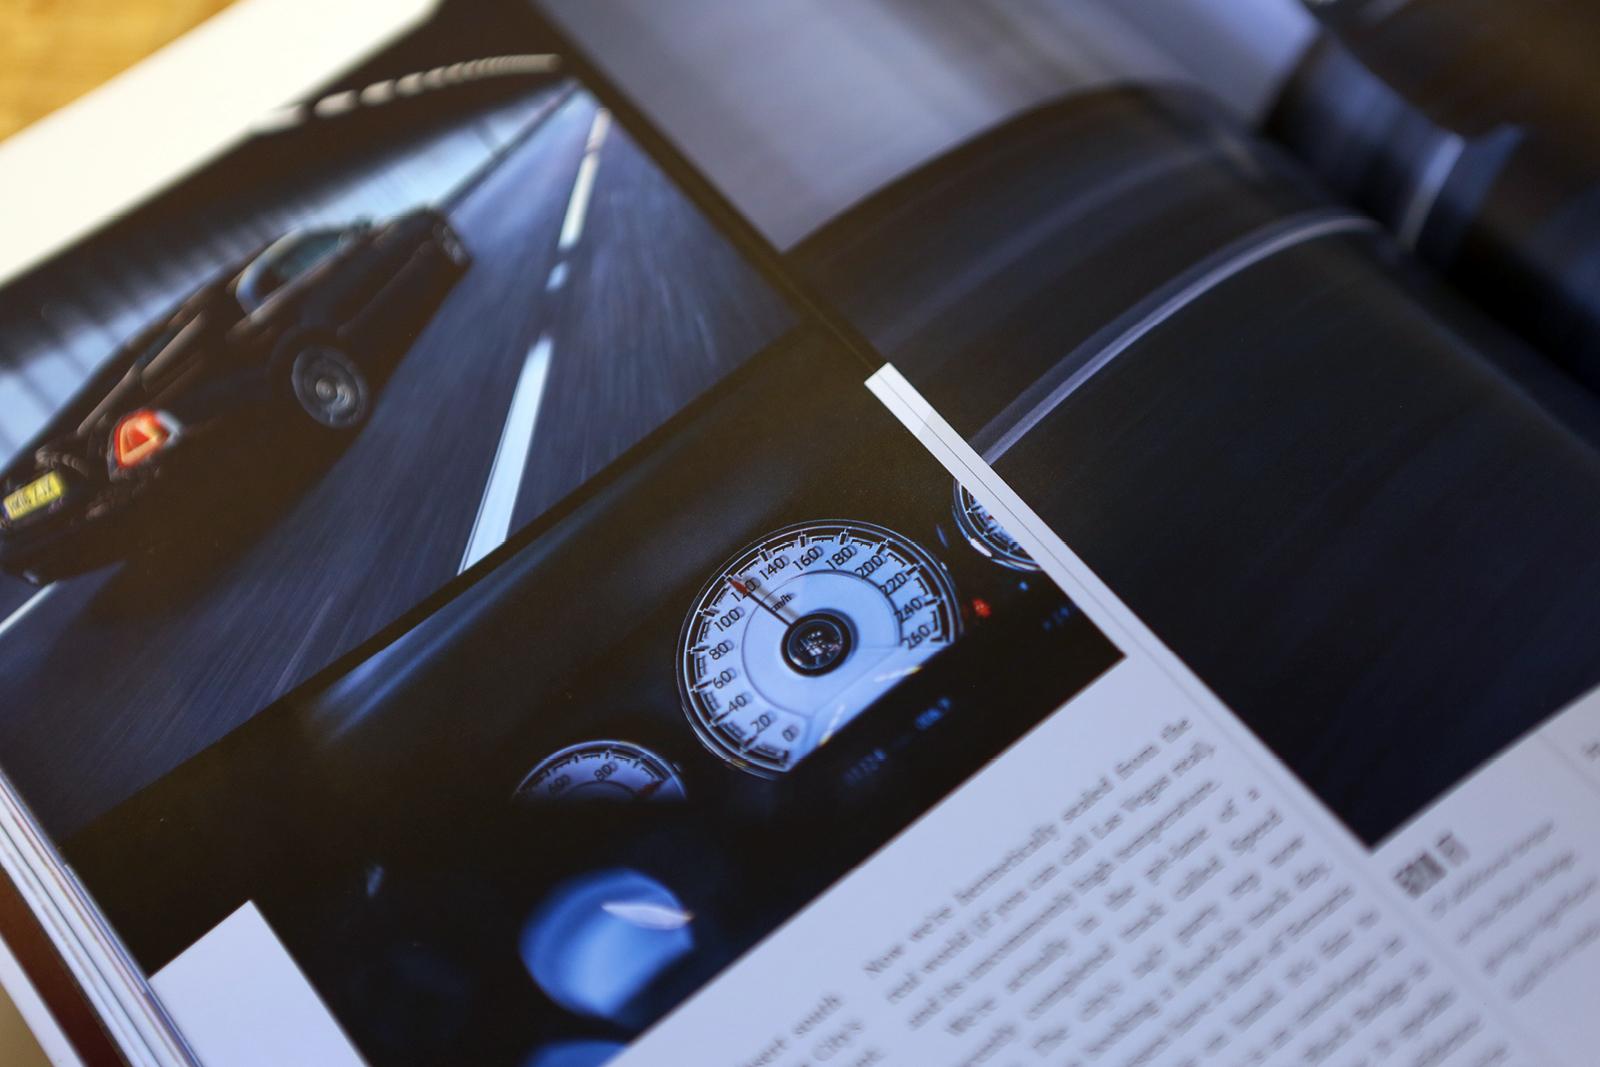 H.R. Owen Drive Magazine: Issue 15 – Rolls-Royce Wraith photoshoot